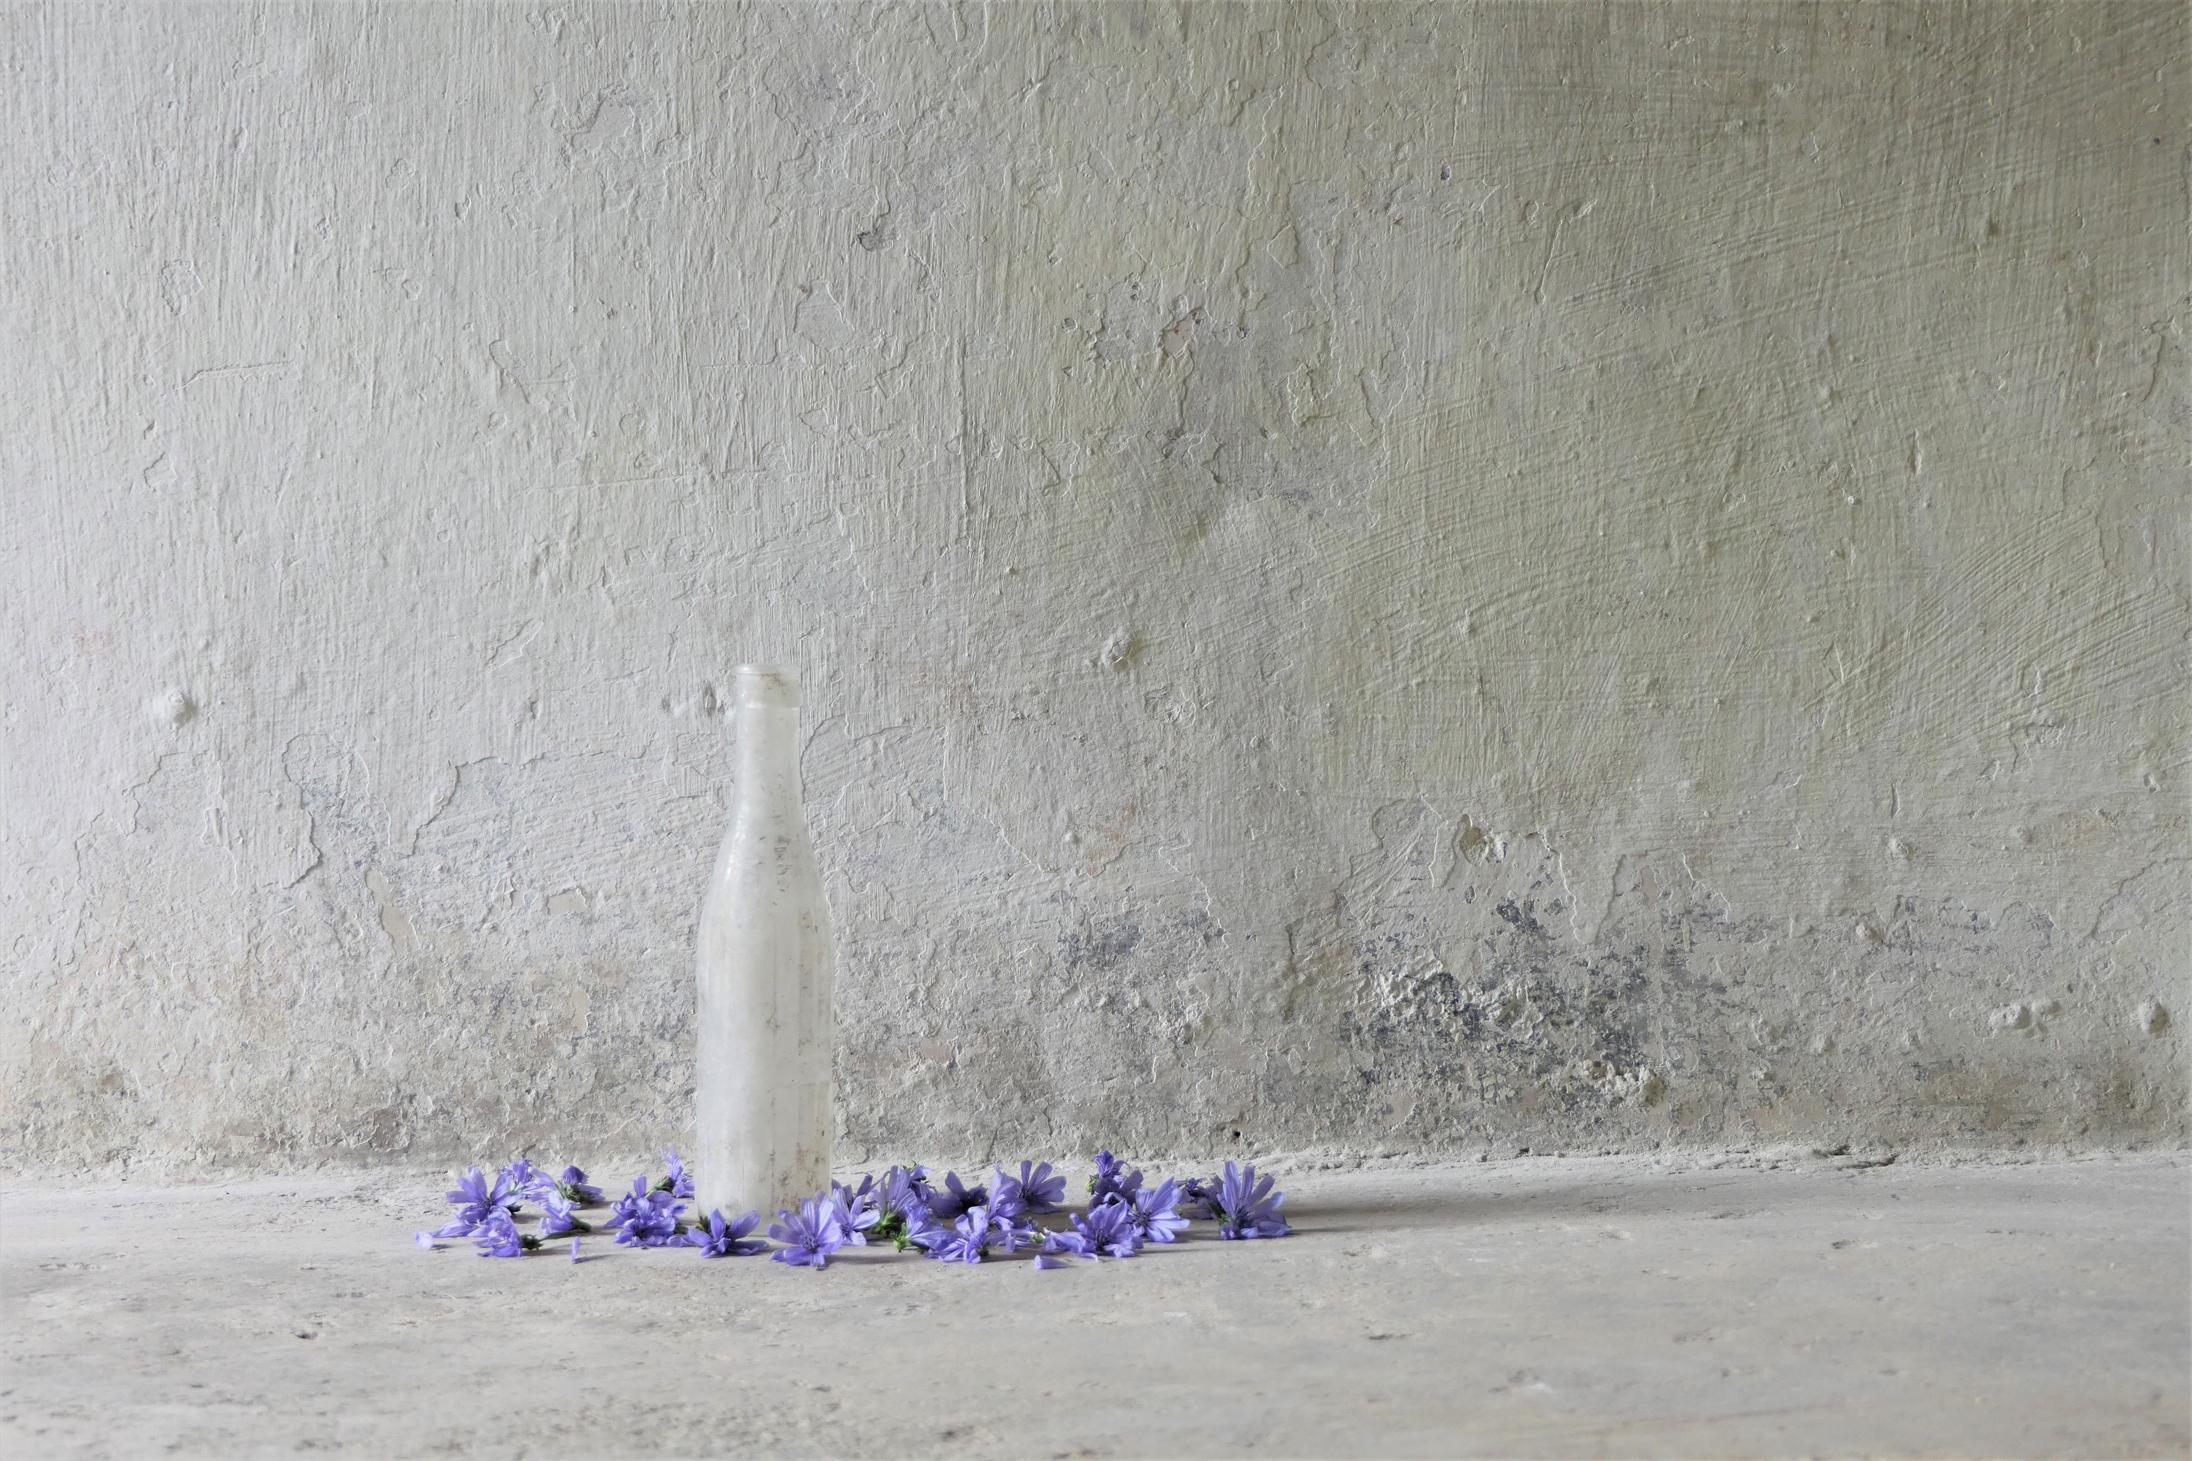 bott fiori(3)